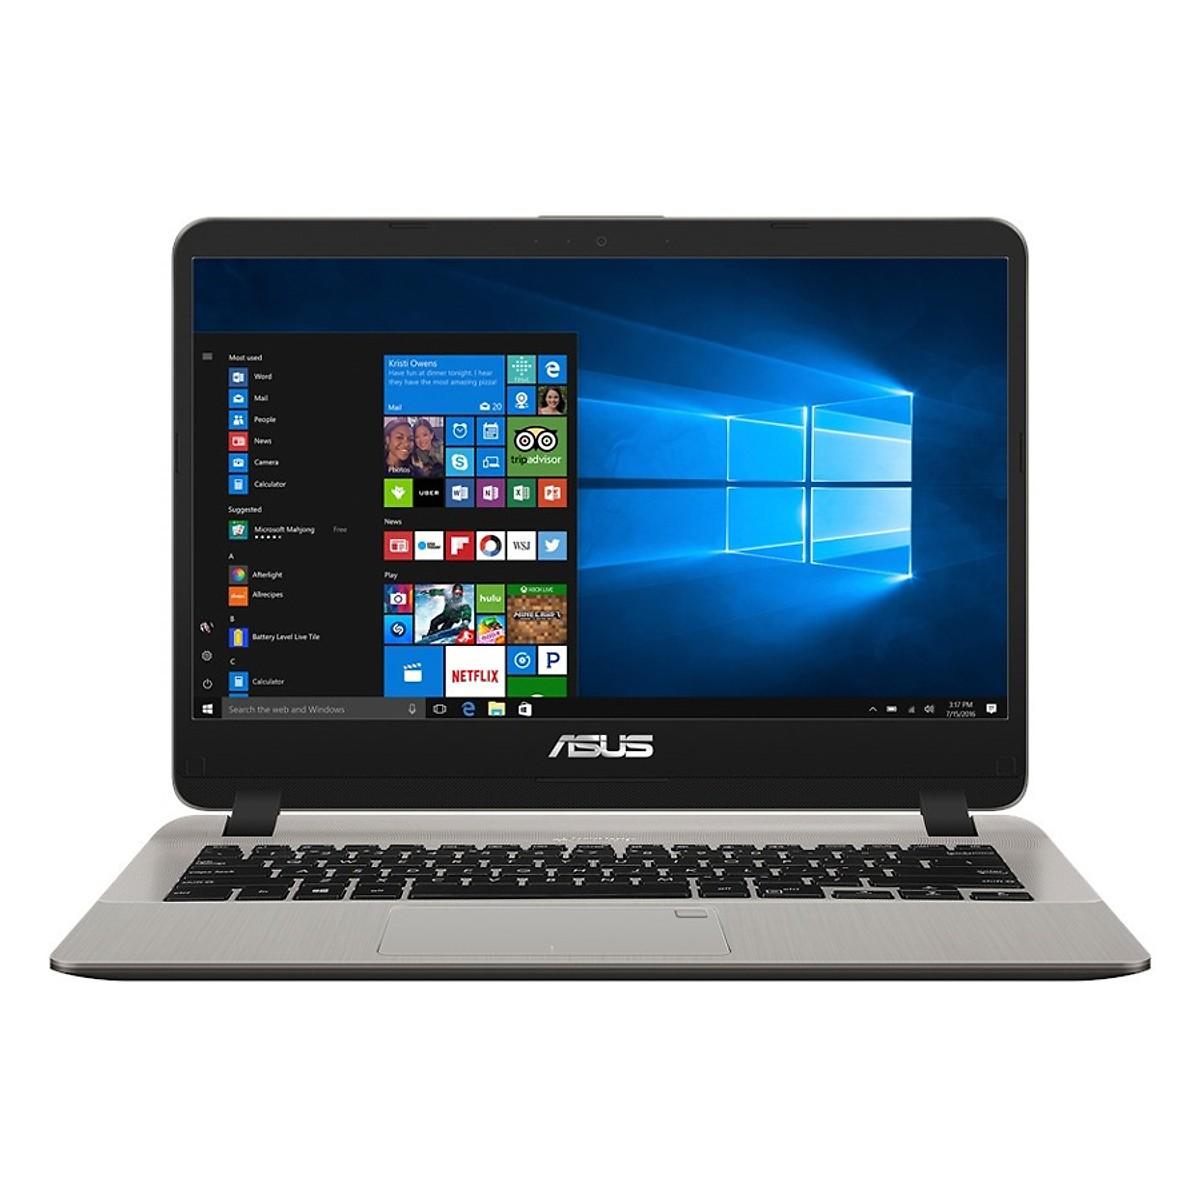 Laptop Asus Vivobook X407UA-BV309T Core i3-7020U/Win10 (14 inch)